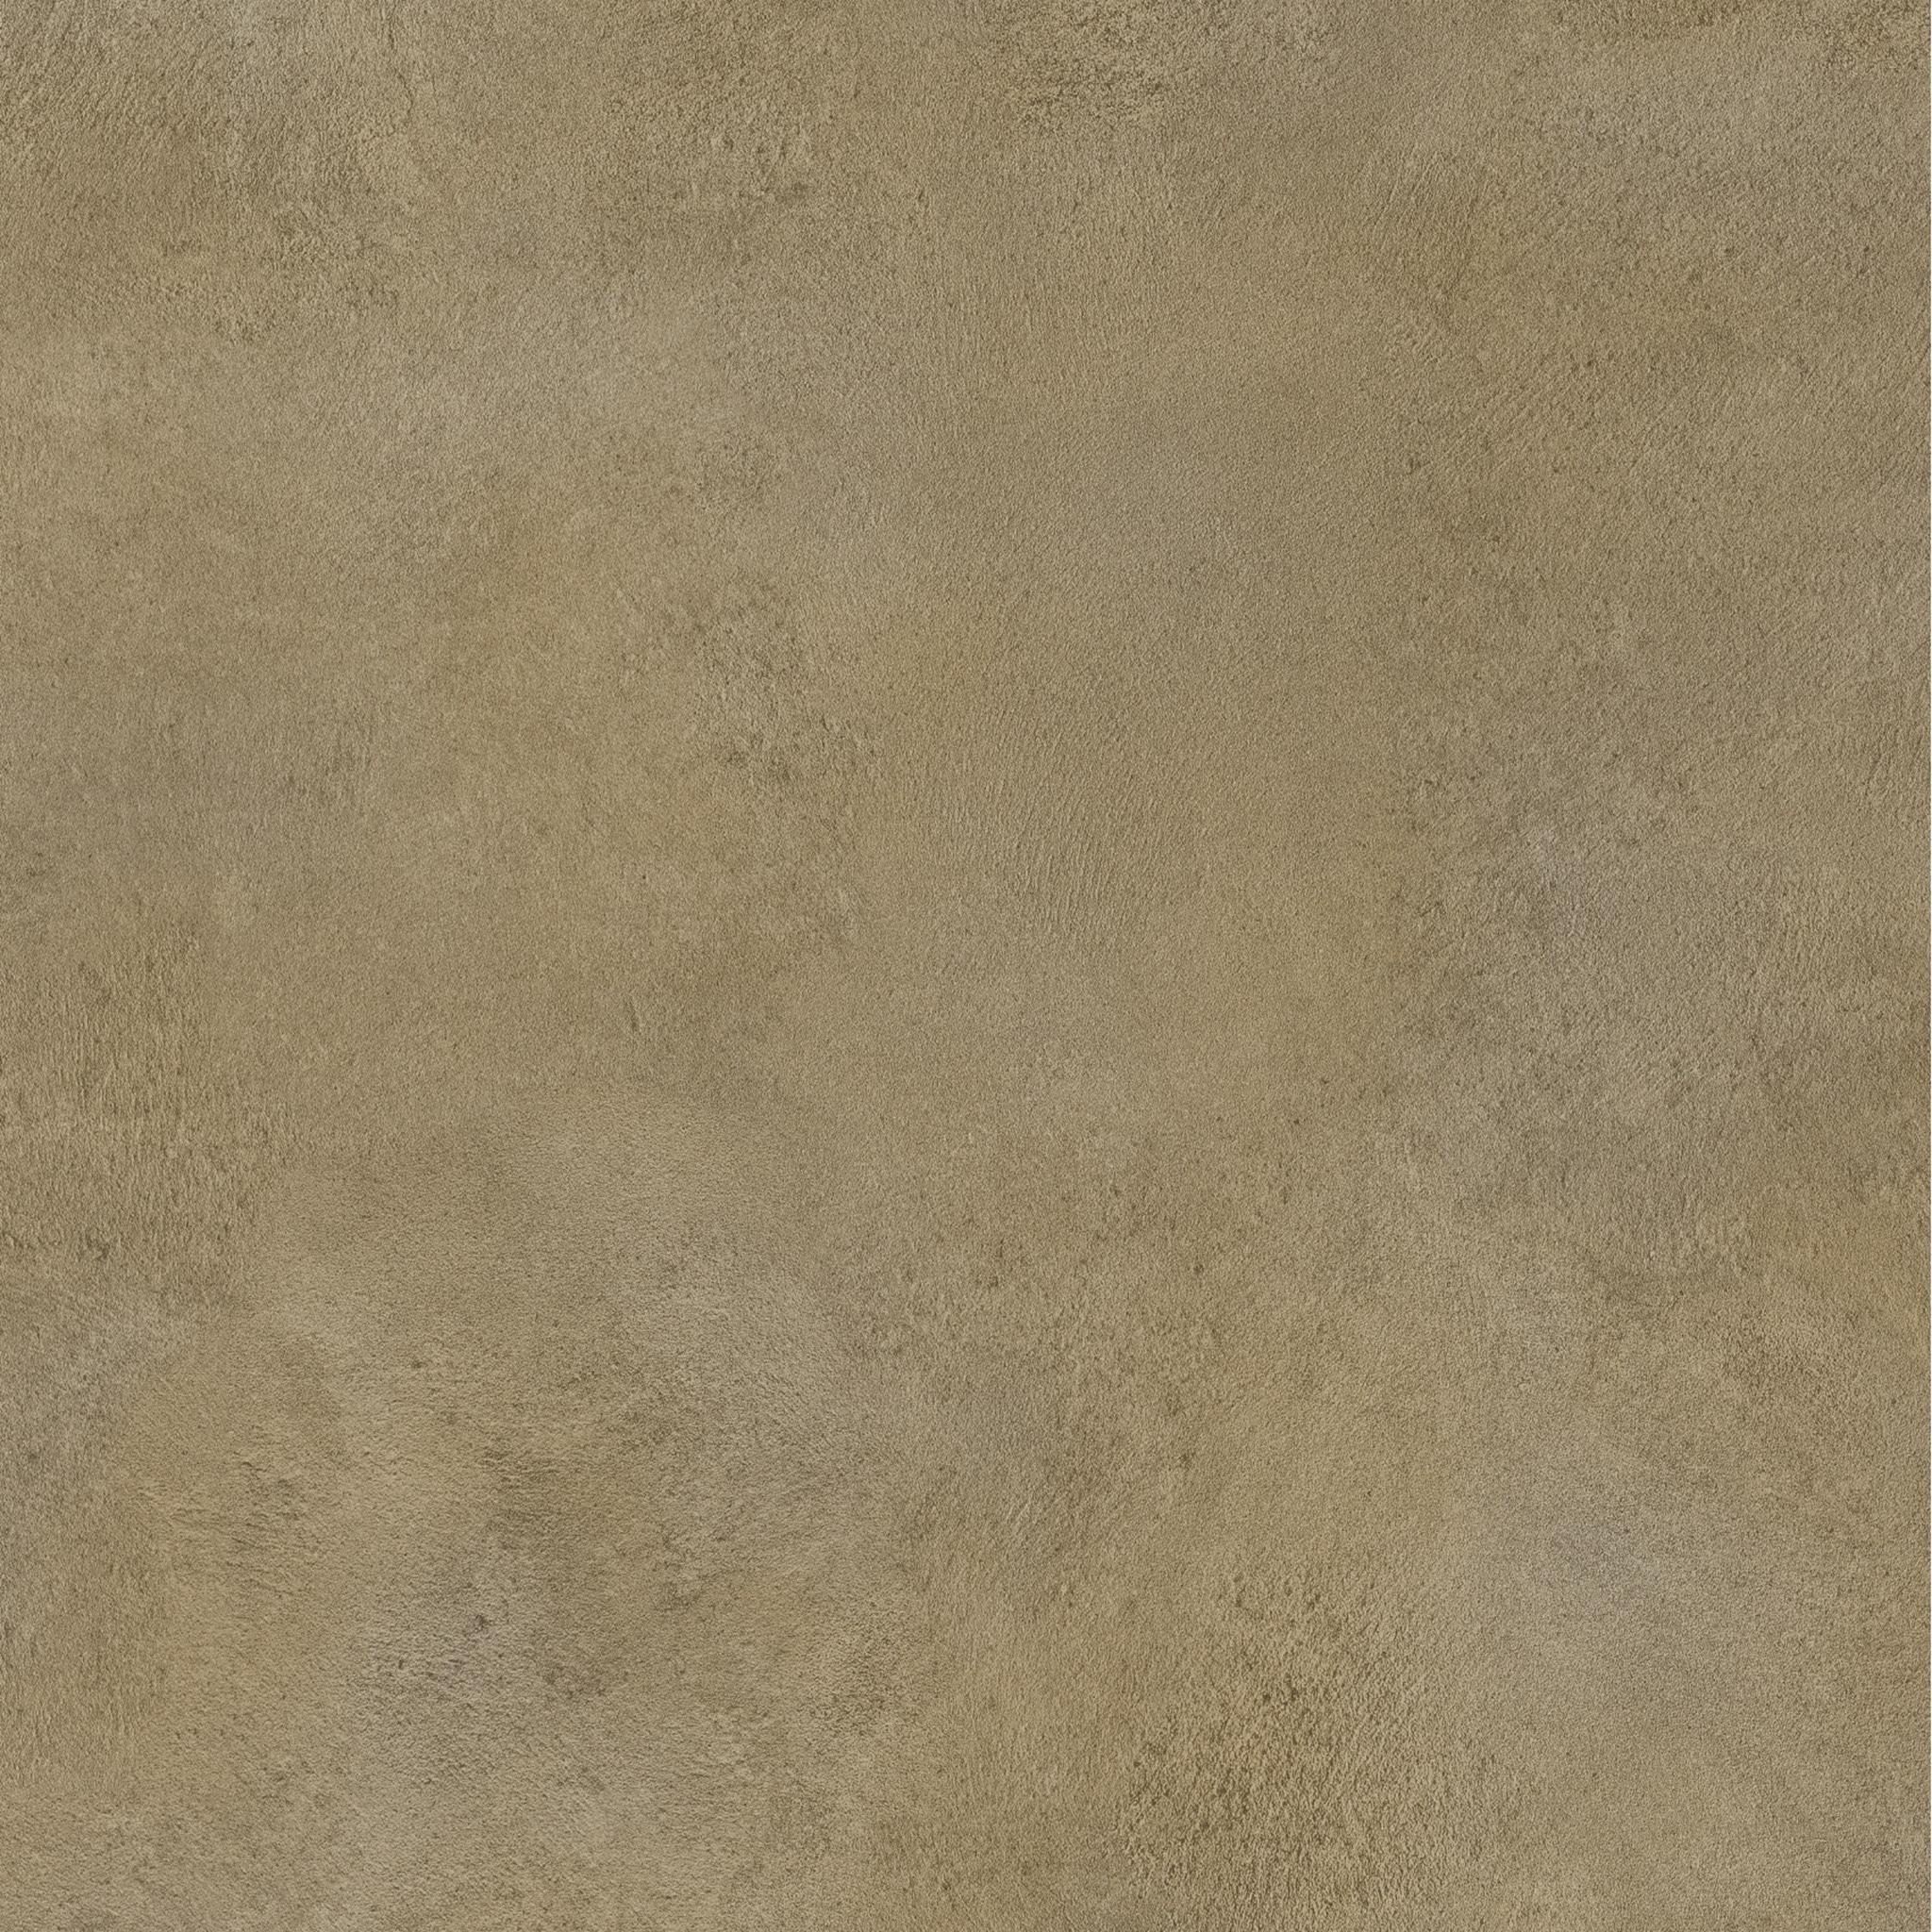 F365 ST16 Amarna Goud  Image